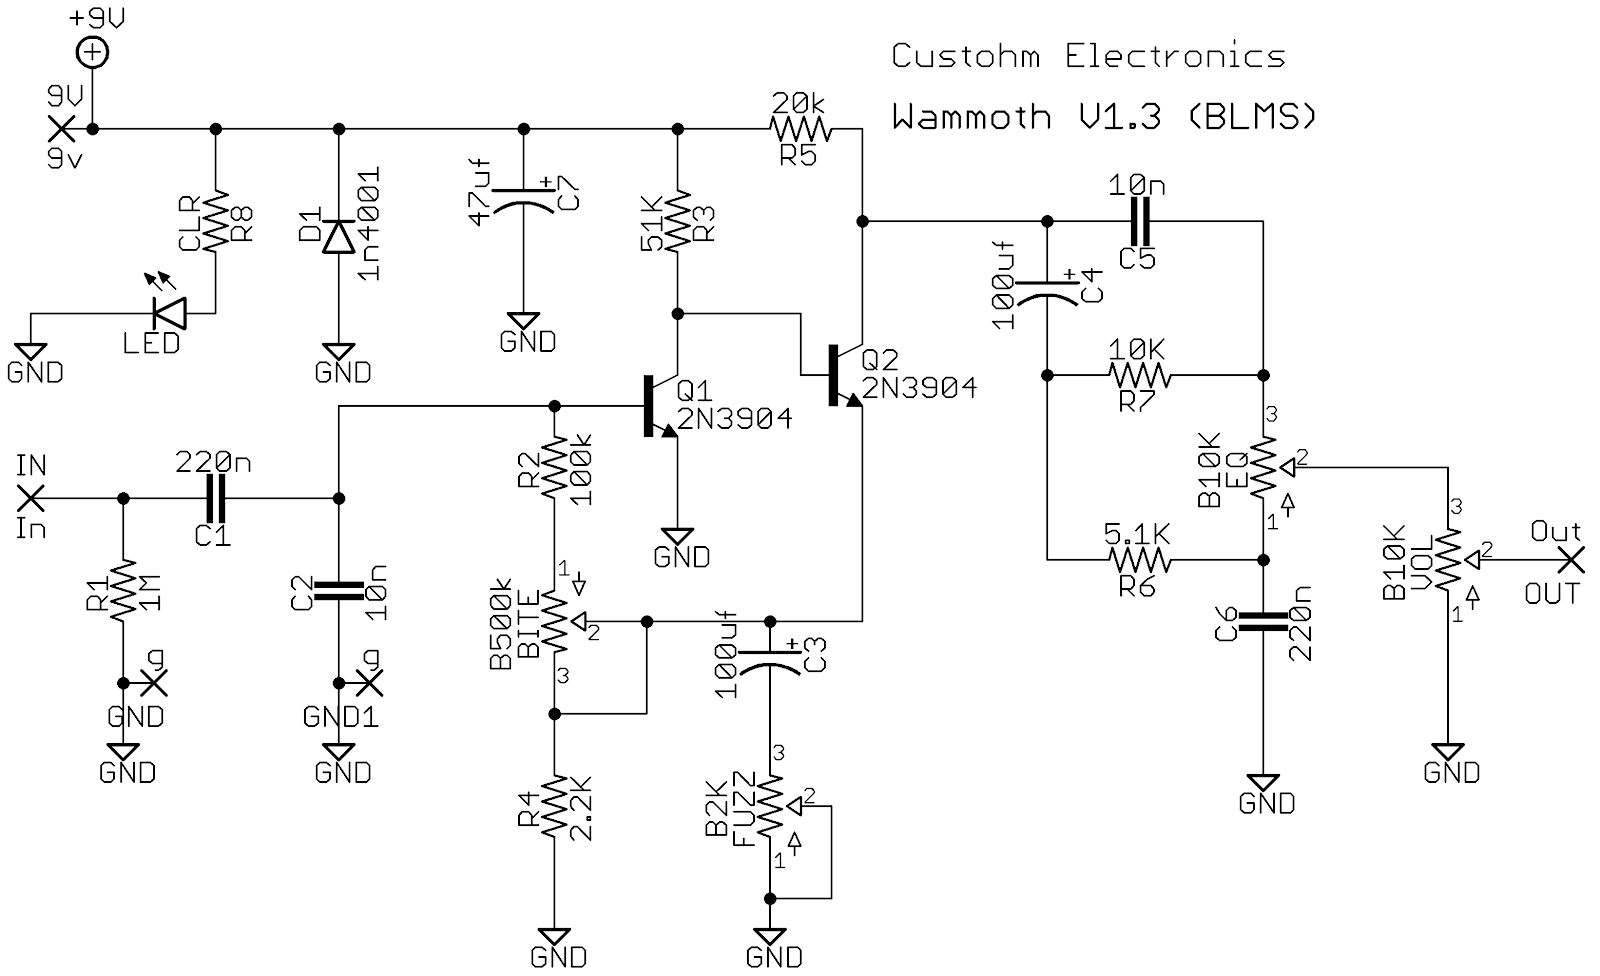 hight resolution of mammoth wiring diagram guide about wiring diagram kentucky mammoth cave national park mammoth wiring diagram blog